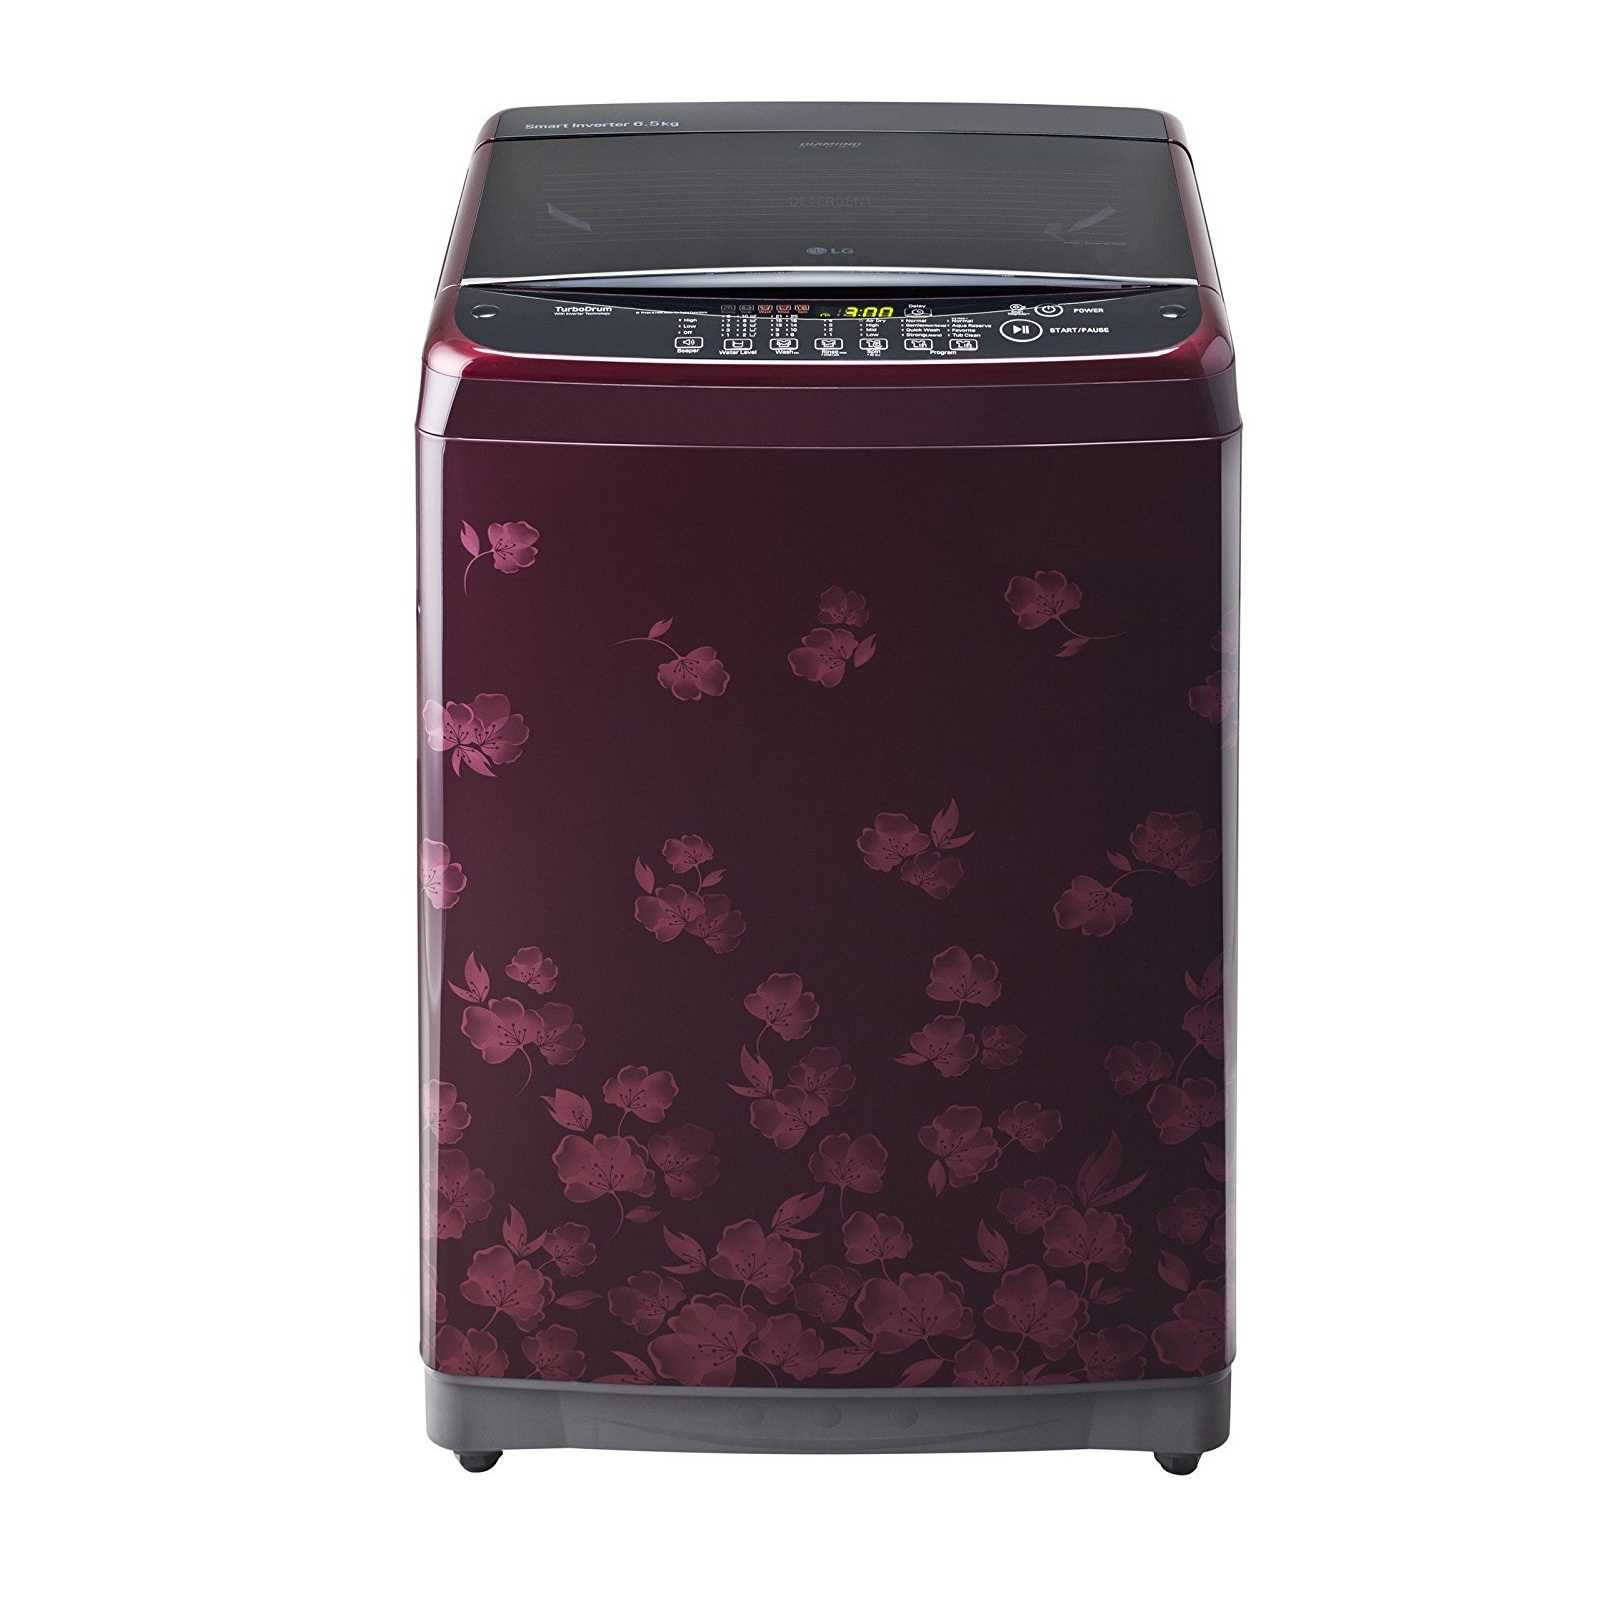 LG T7581NEDL8 6.5 Kg Fully Automatic Top Loading Washing Machine